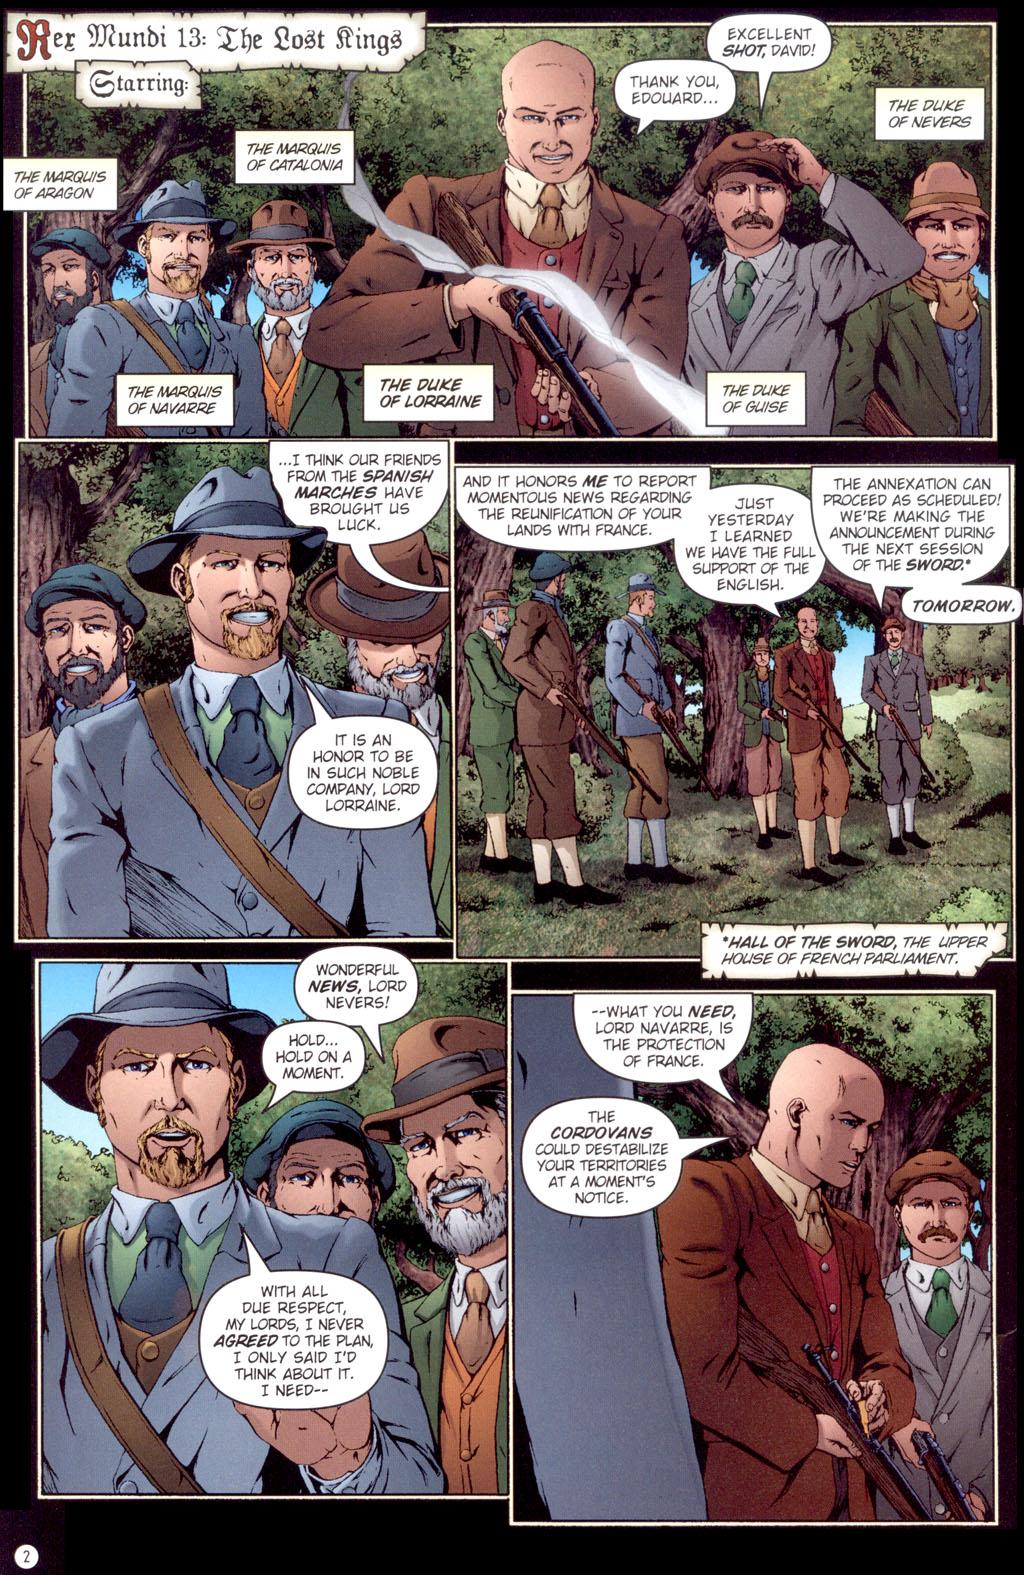 Read online Rex Mundi comic -  Issue #13 - 4